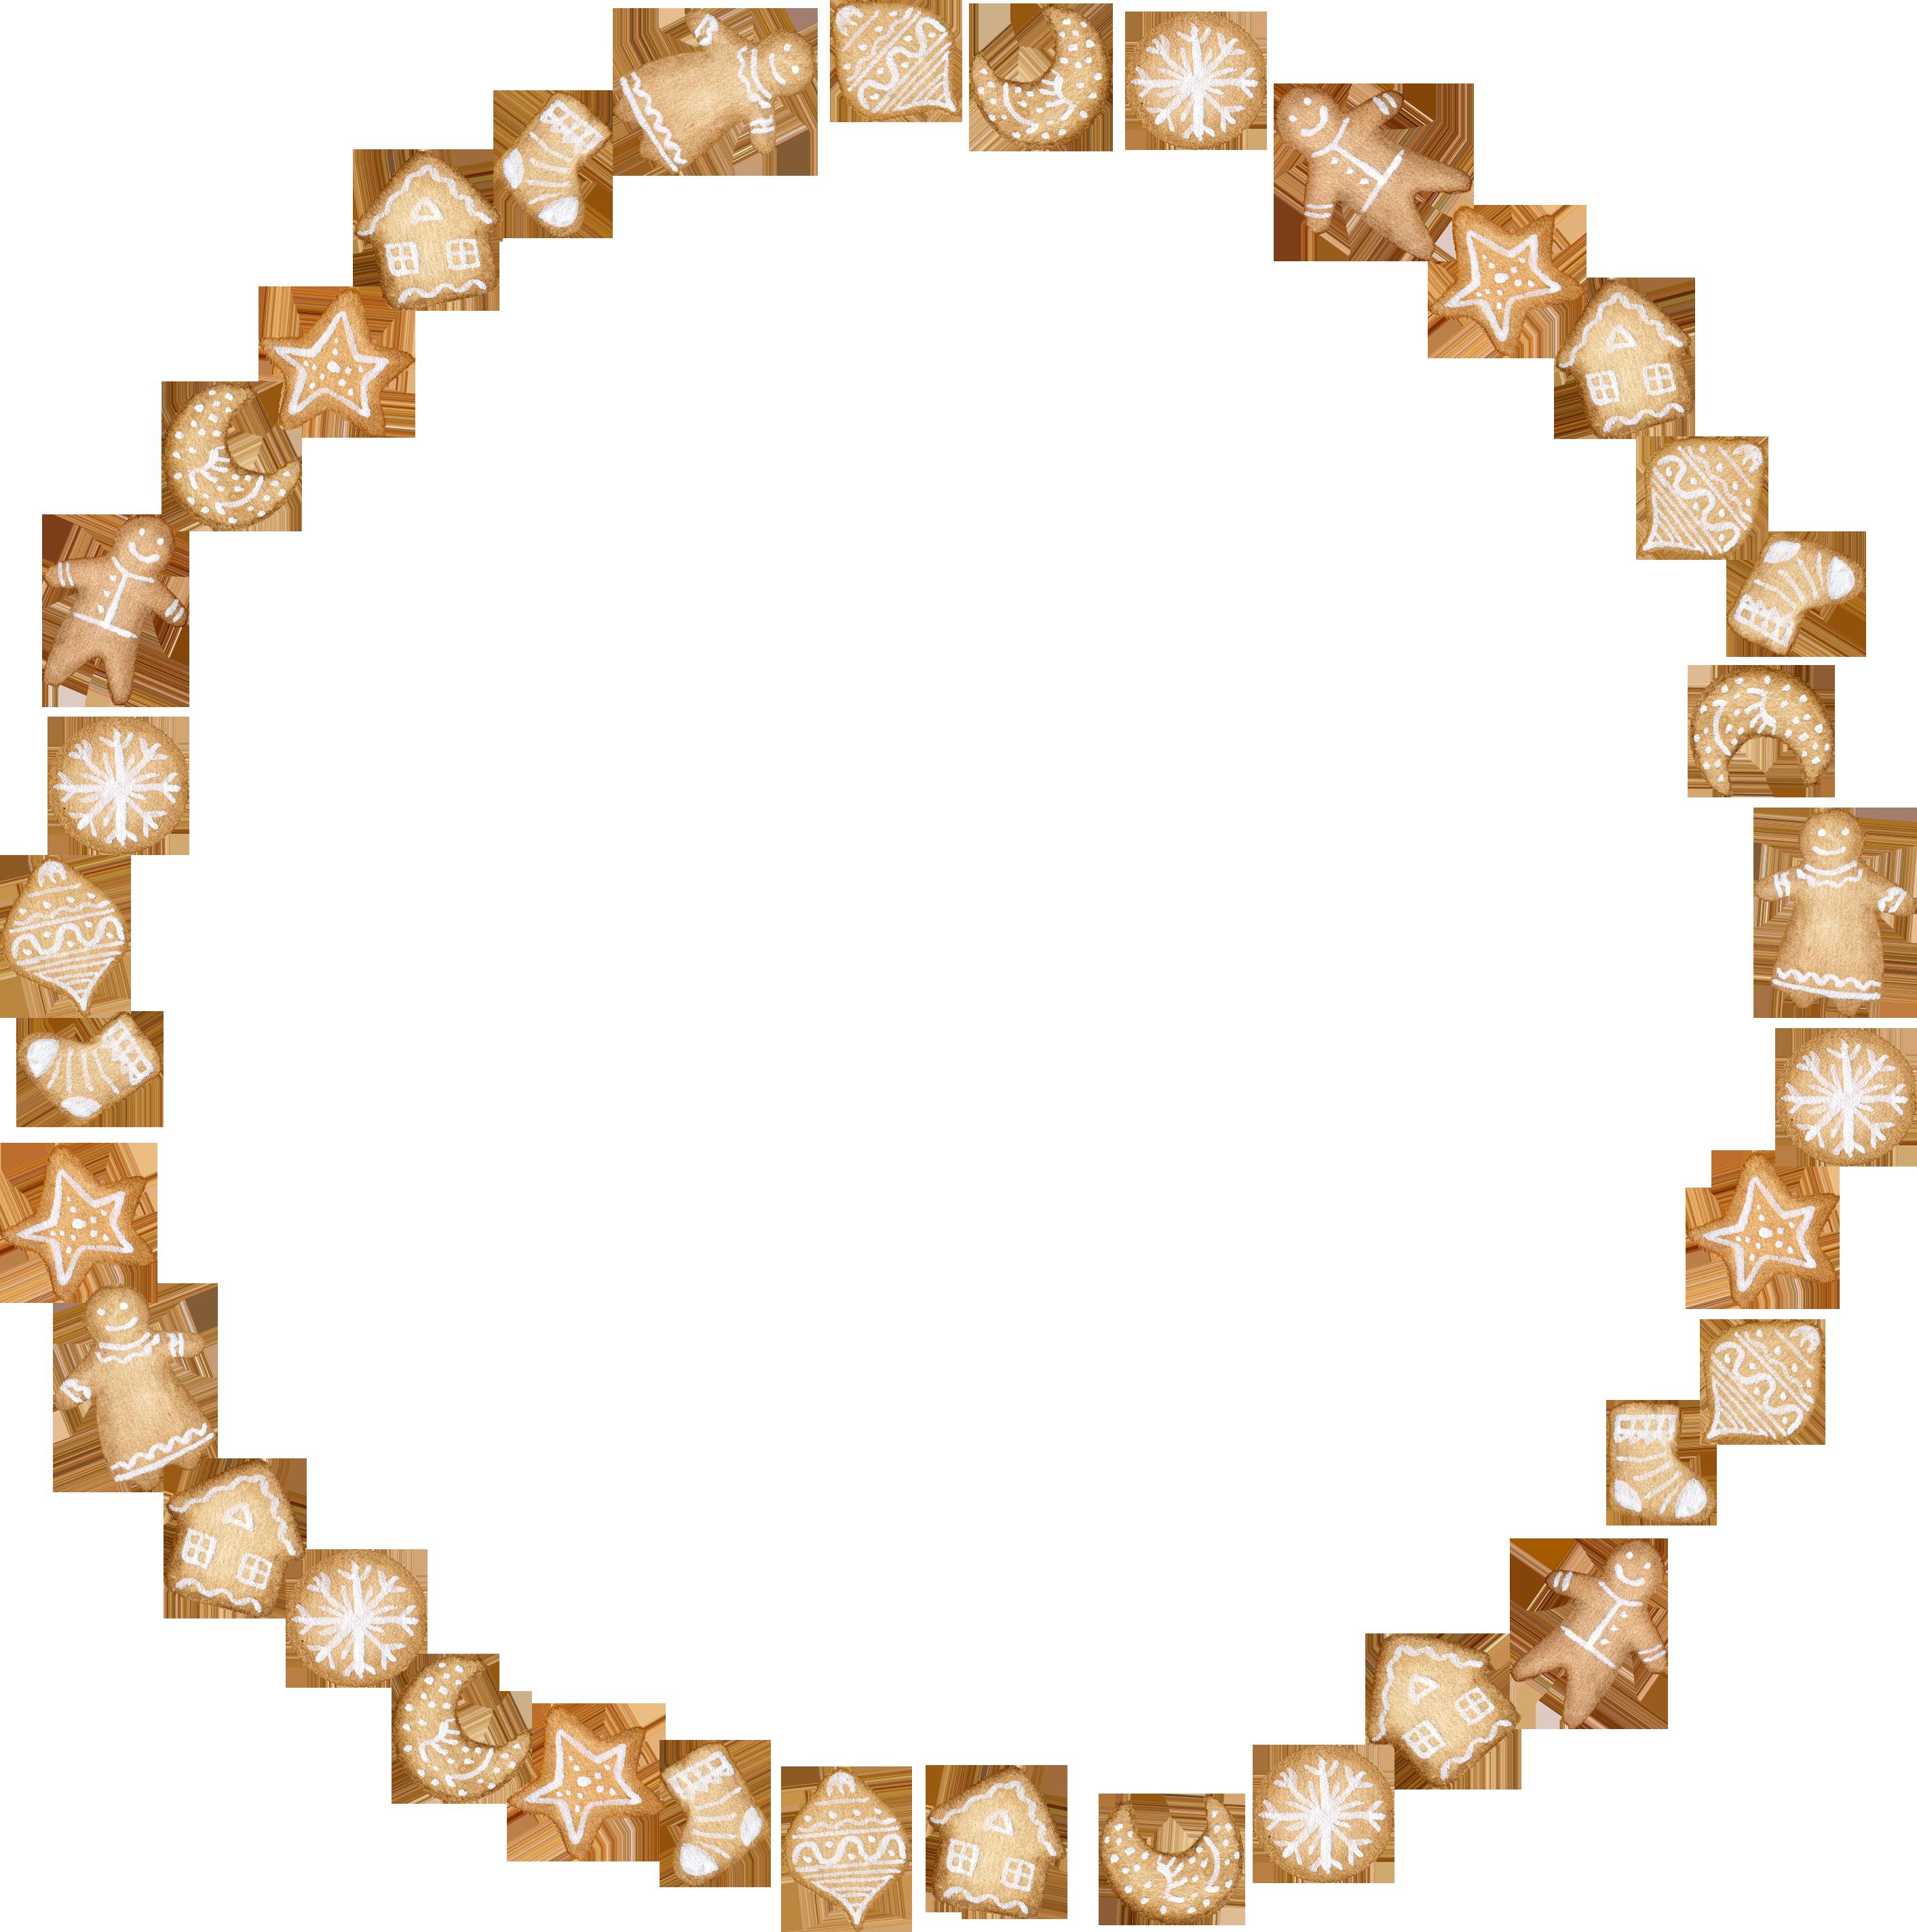 Jewelry clipart 1444746.